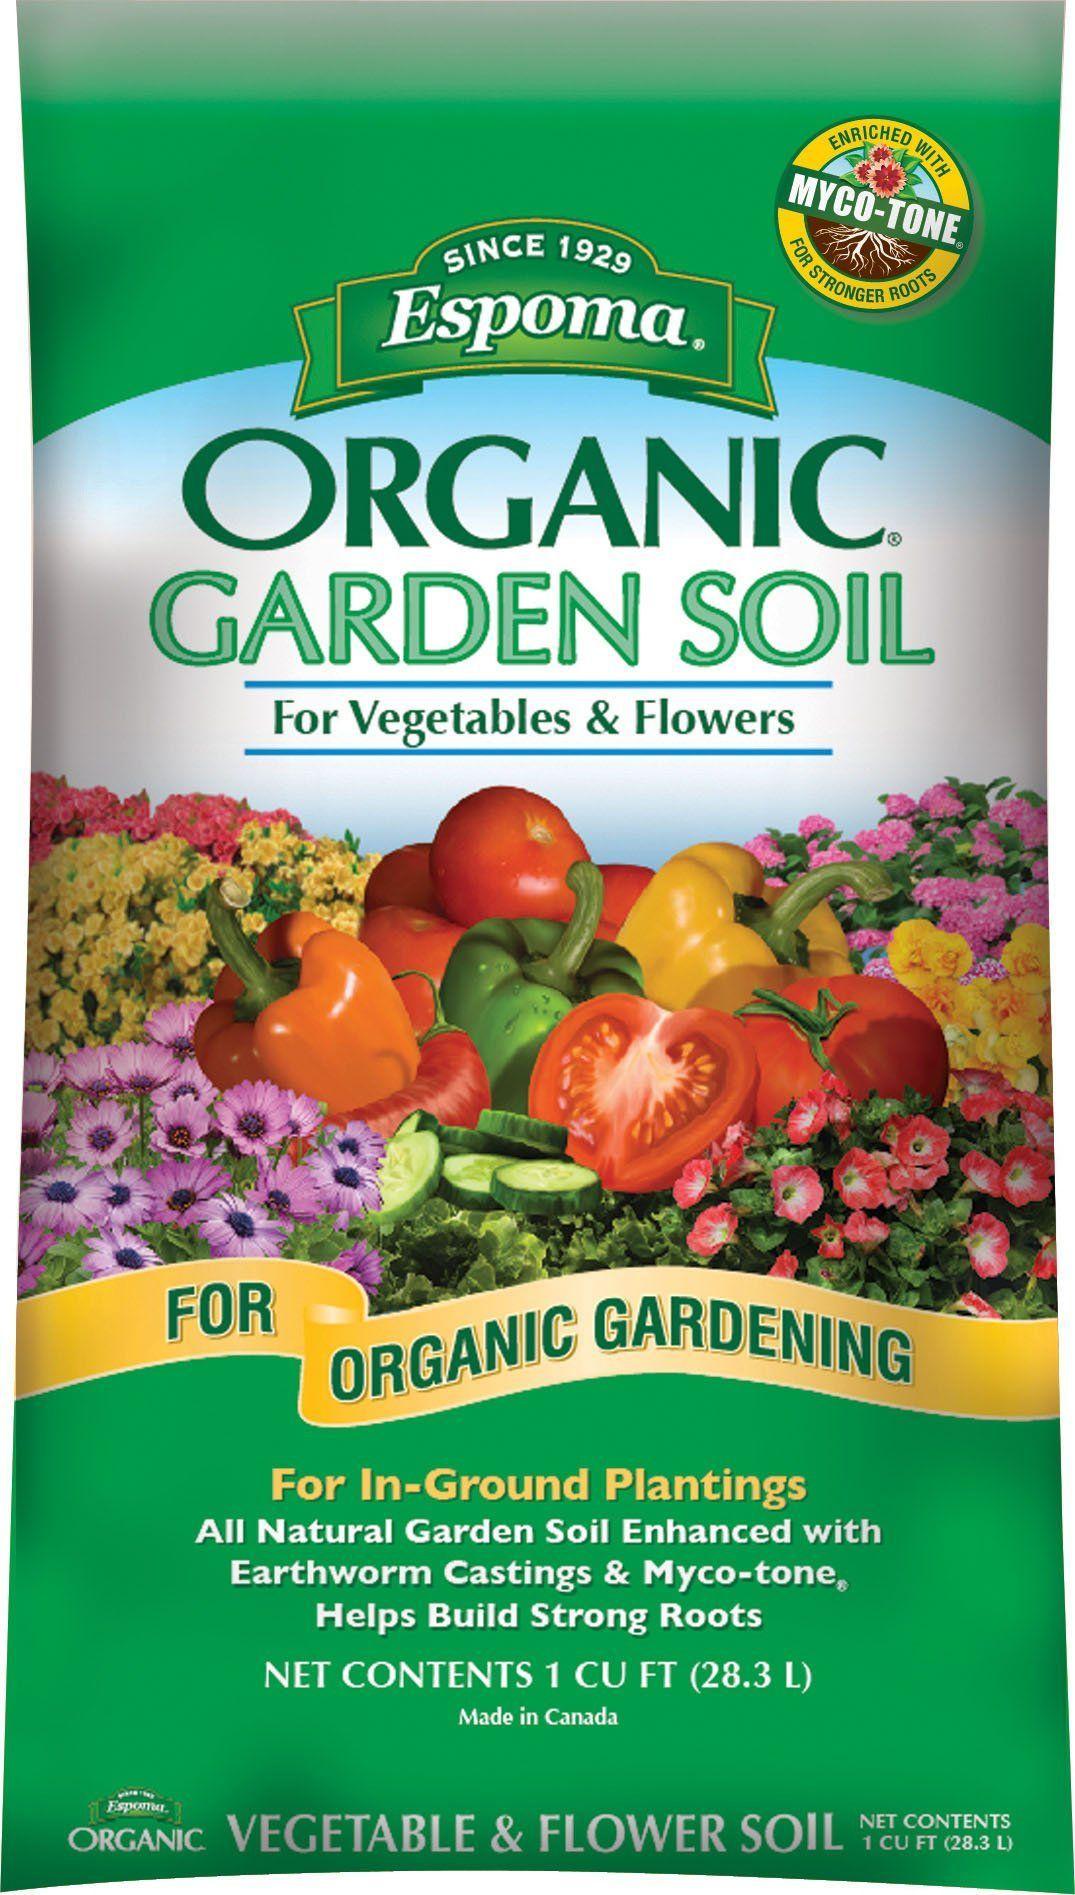 Espoma Company Soils Organic Garden Soil For Vegetables And